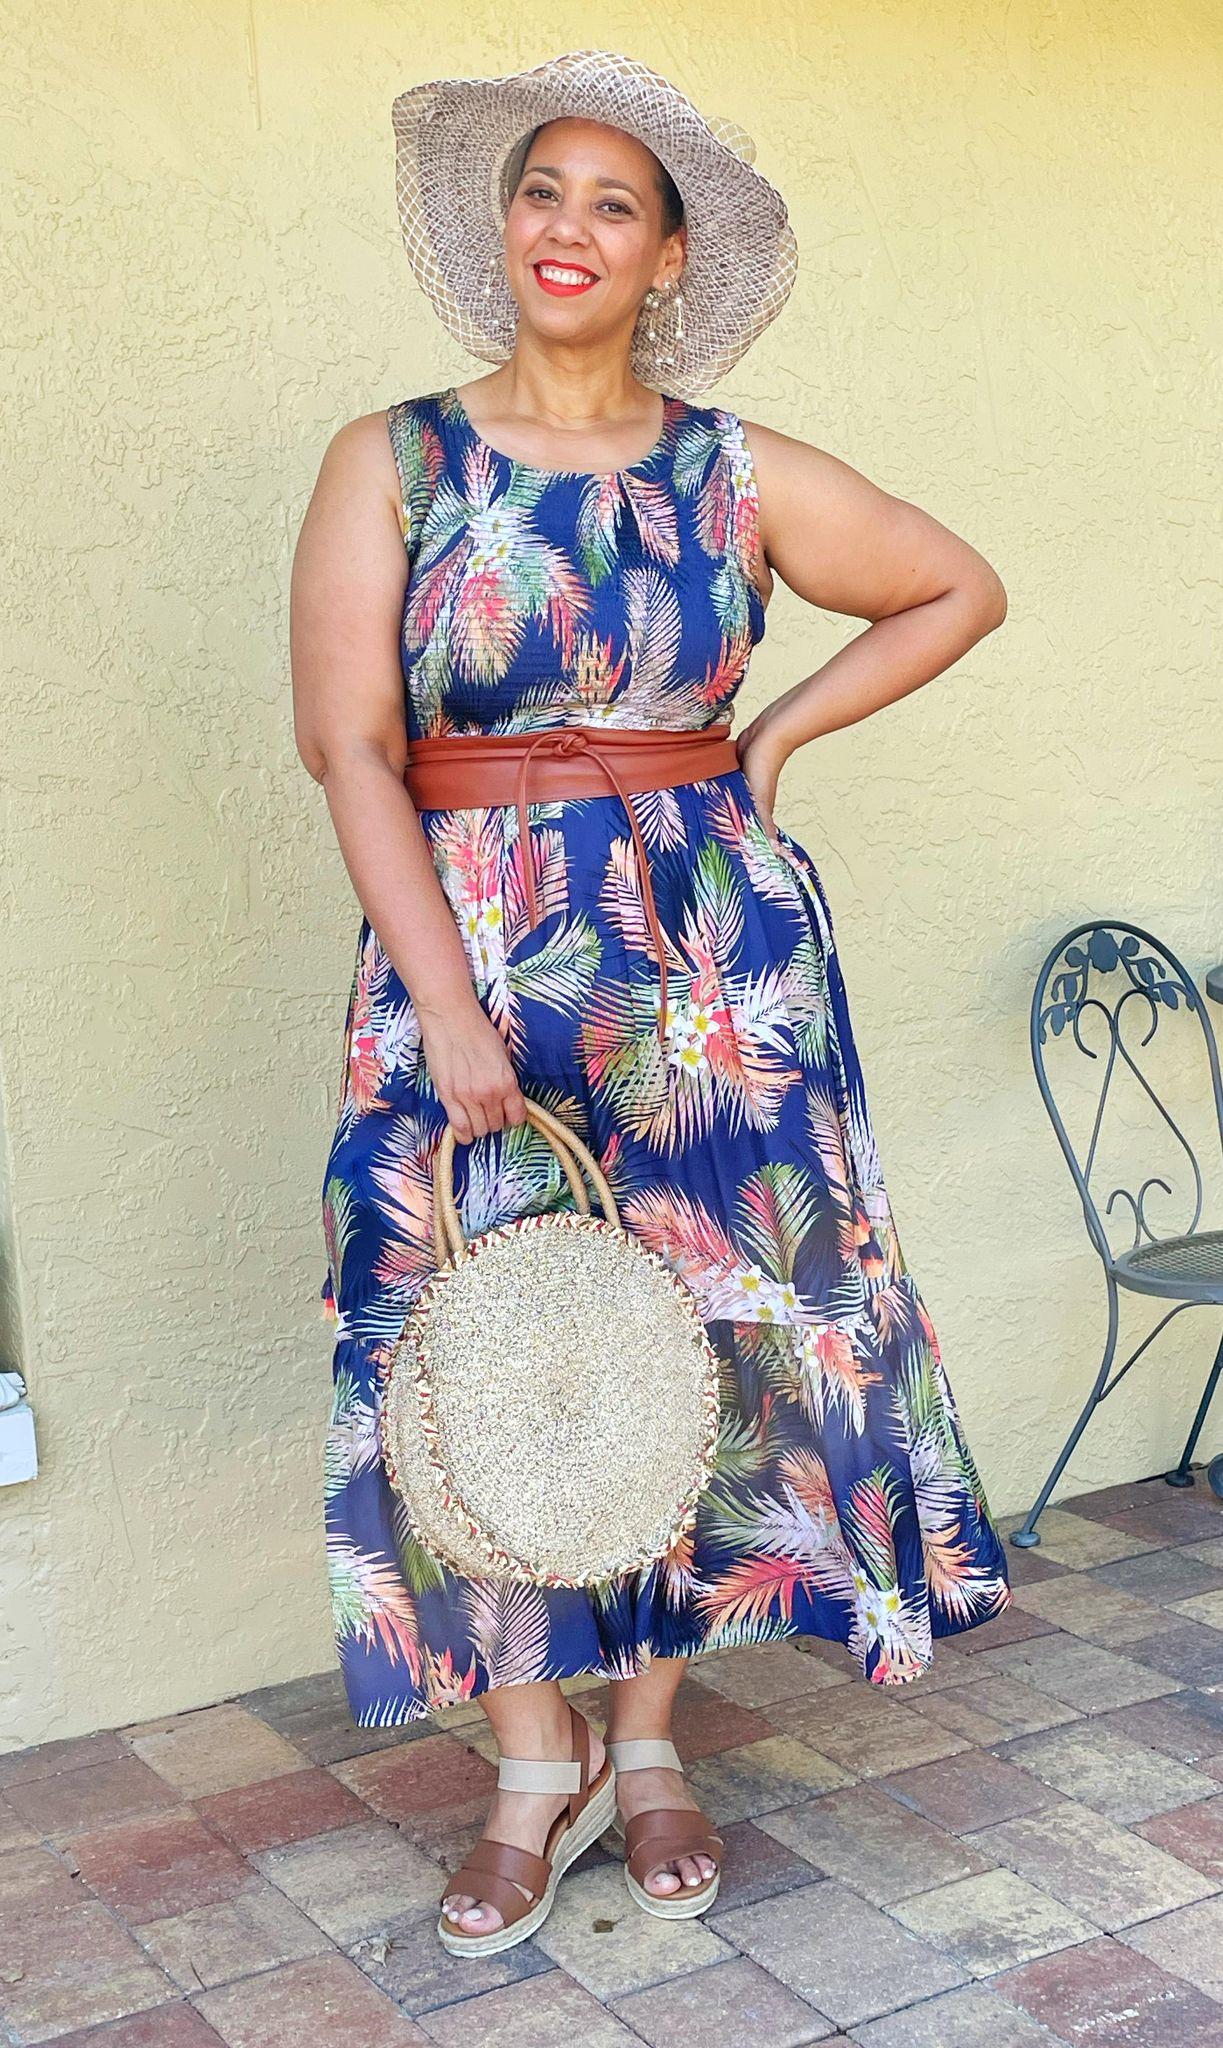 farrah estrella in a palm print dress